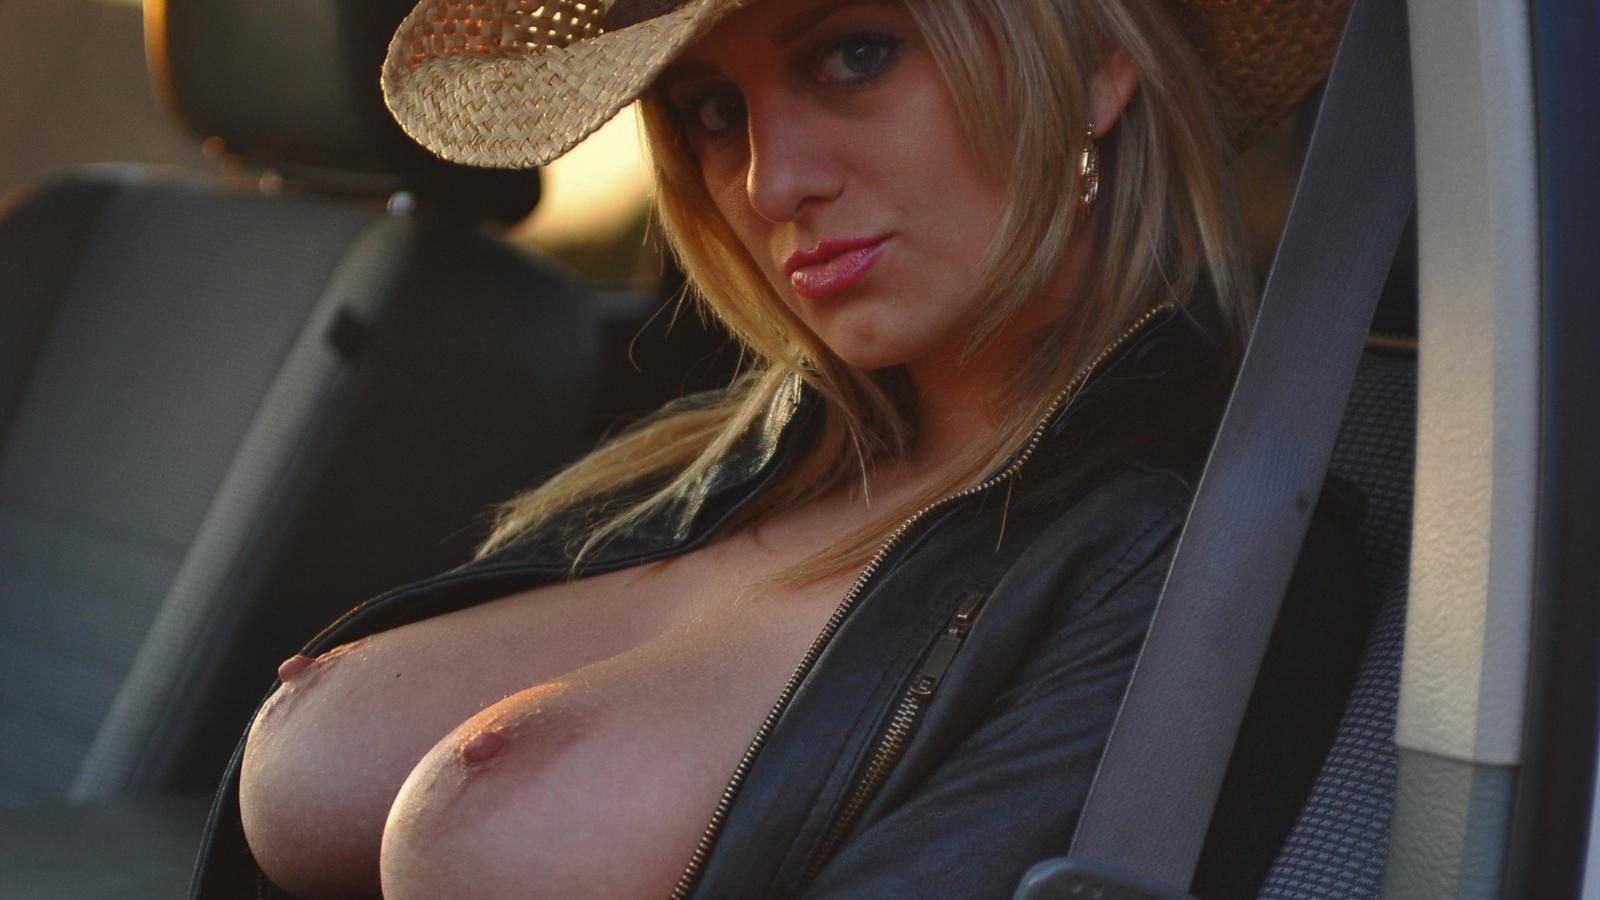 download photo 1600x900 jenny mcclain model amazing blonde big